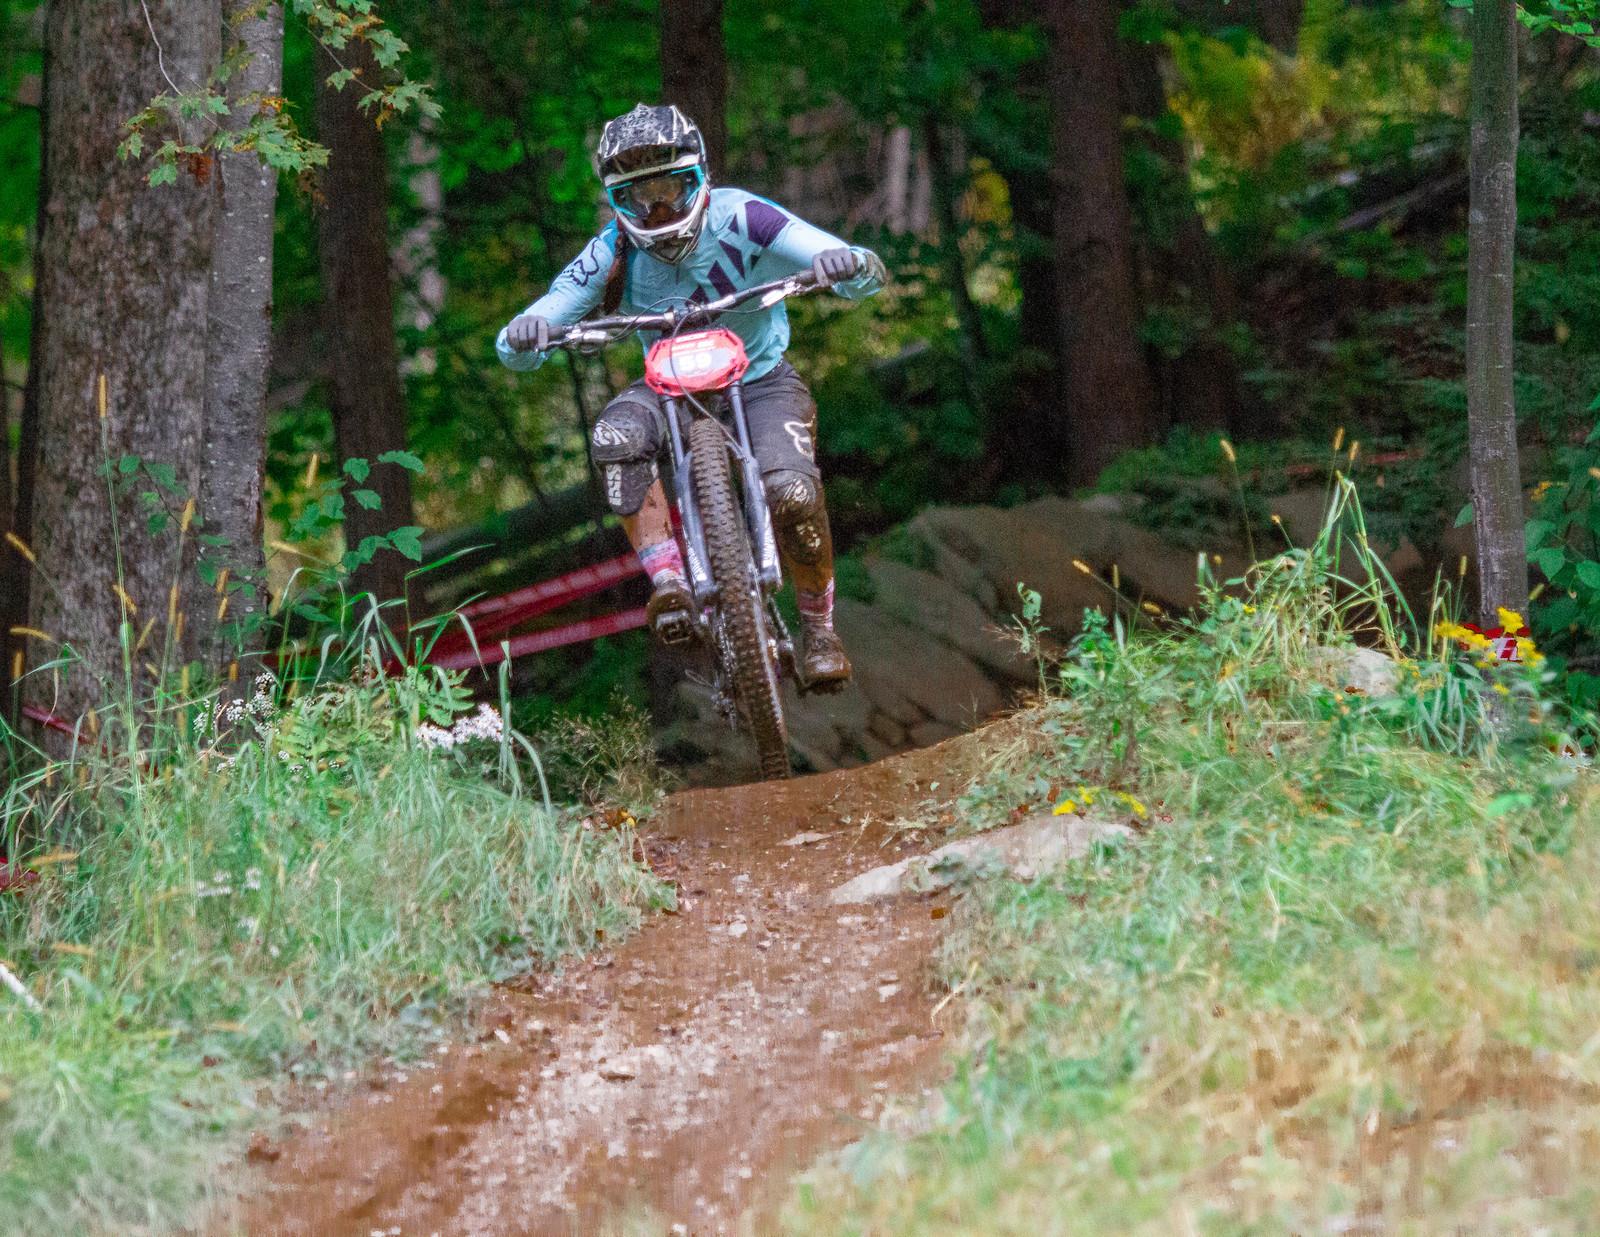 Maxine Bergeron - JackRice - Mountain Biking Pictures - Vital MTB